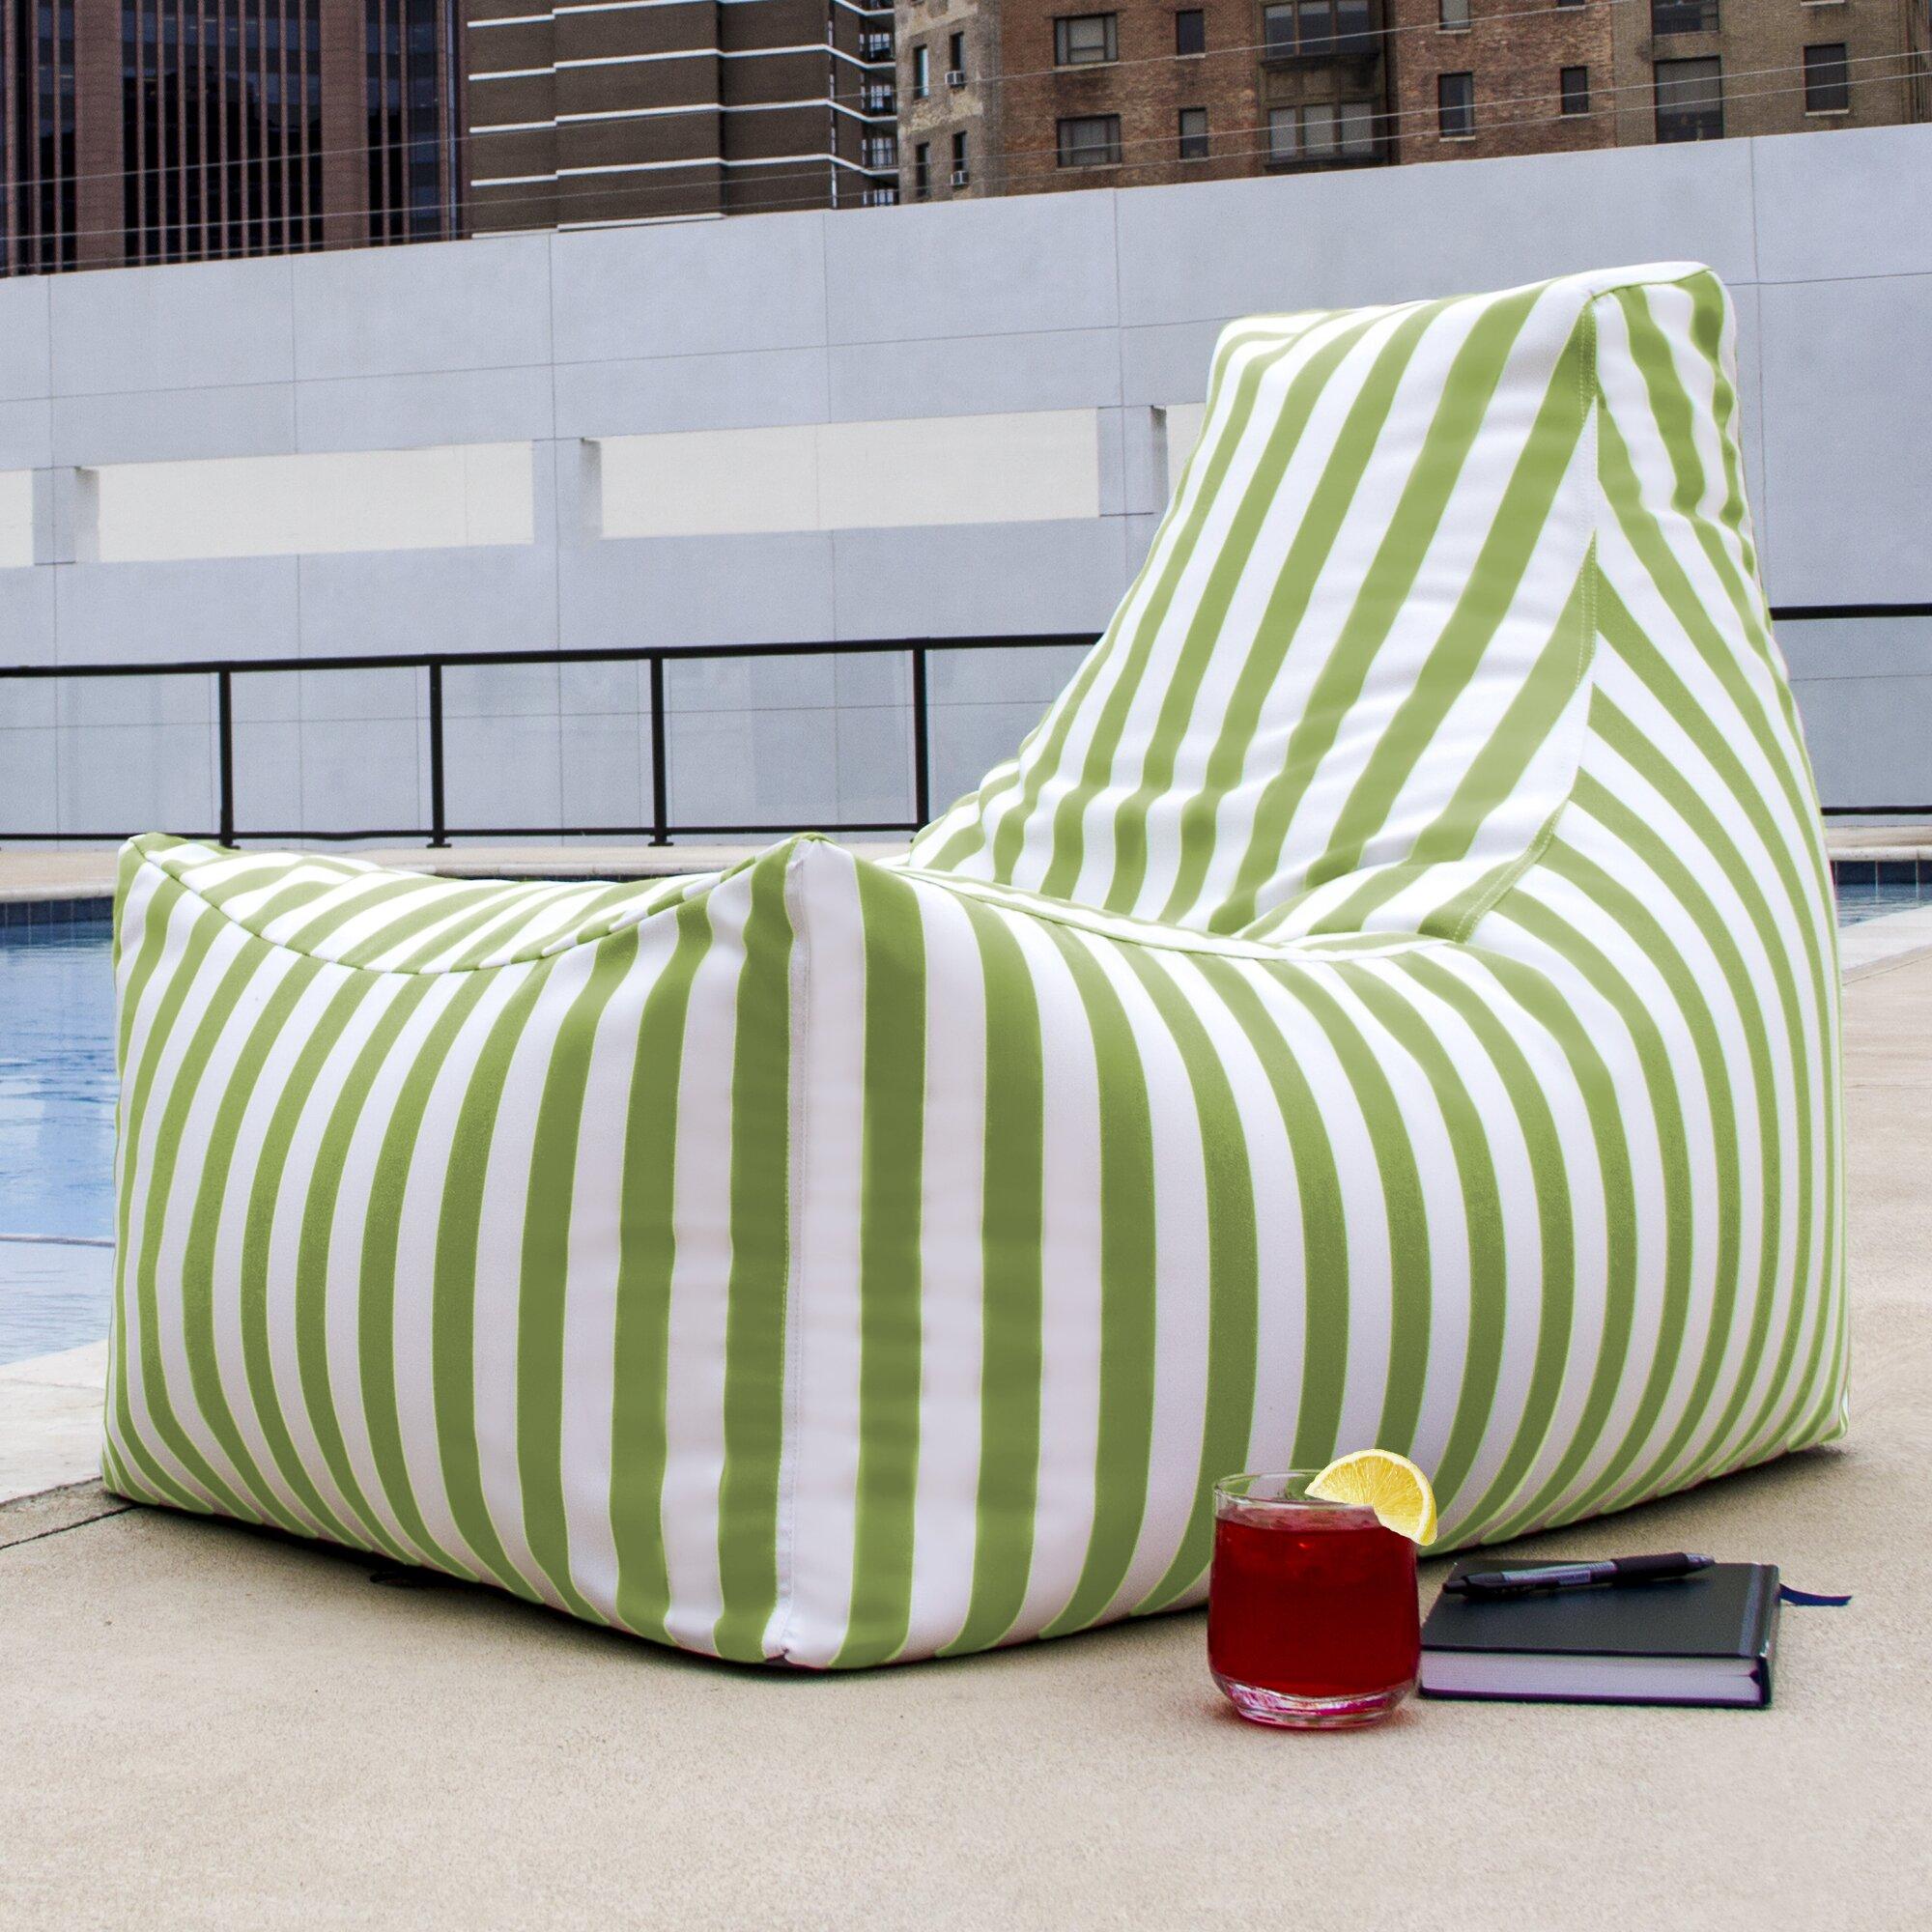 Jaxx Juniper Outdoor Striped Bean Bag Chair & Reviews